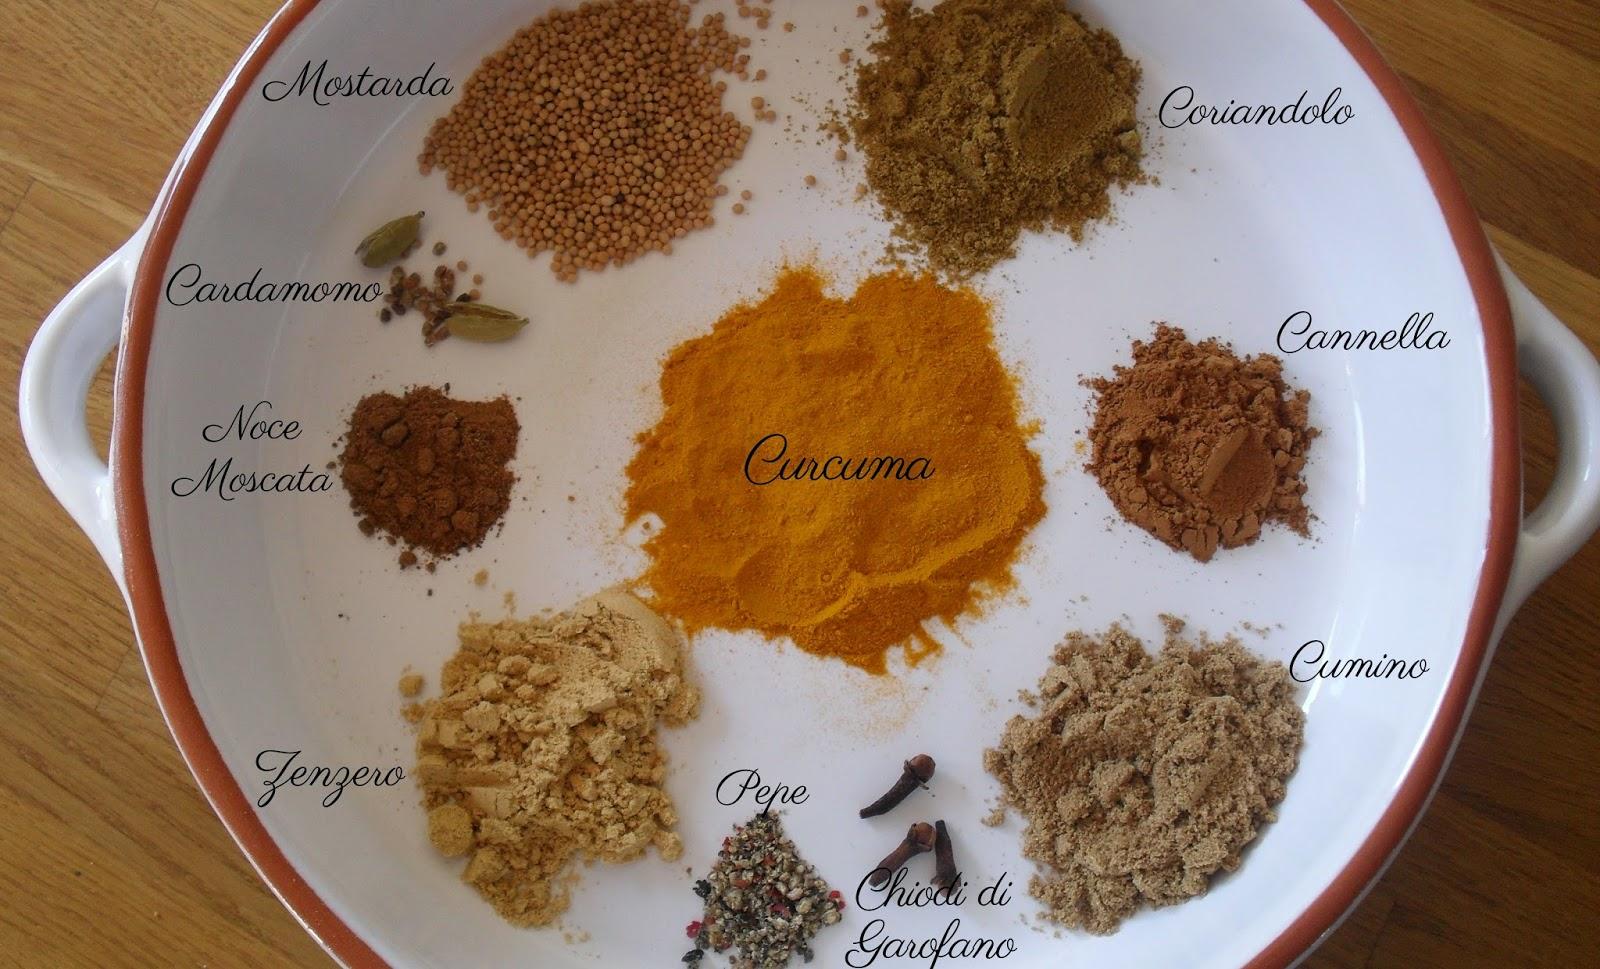 http://blog.giallozafferano.it/msp/wp-content/uploads/2012/09/SDC14171-ingredienti-logo.jpg